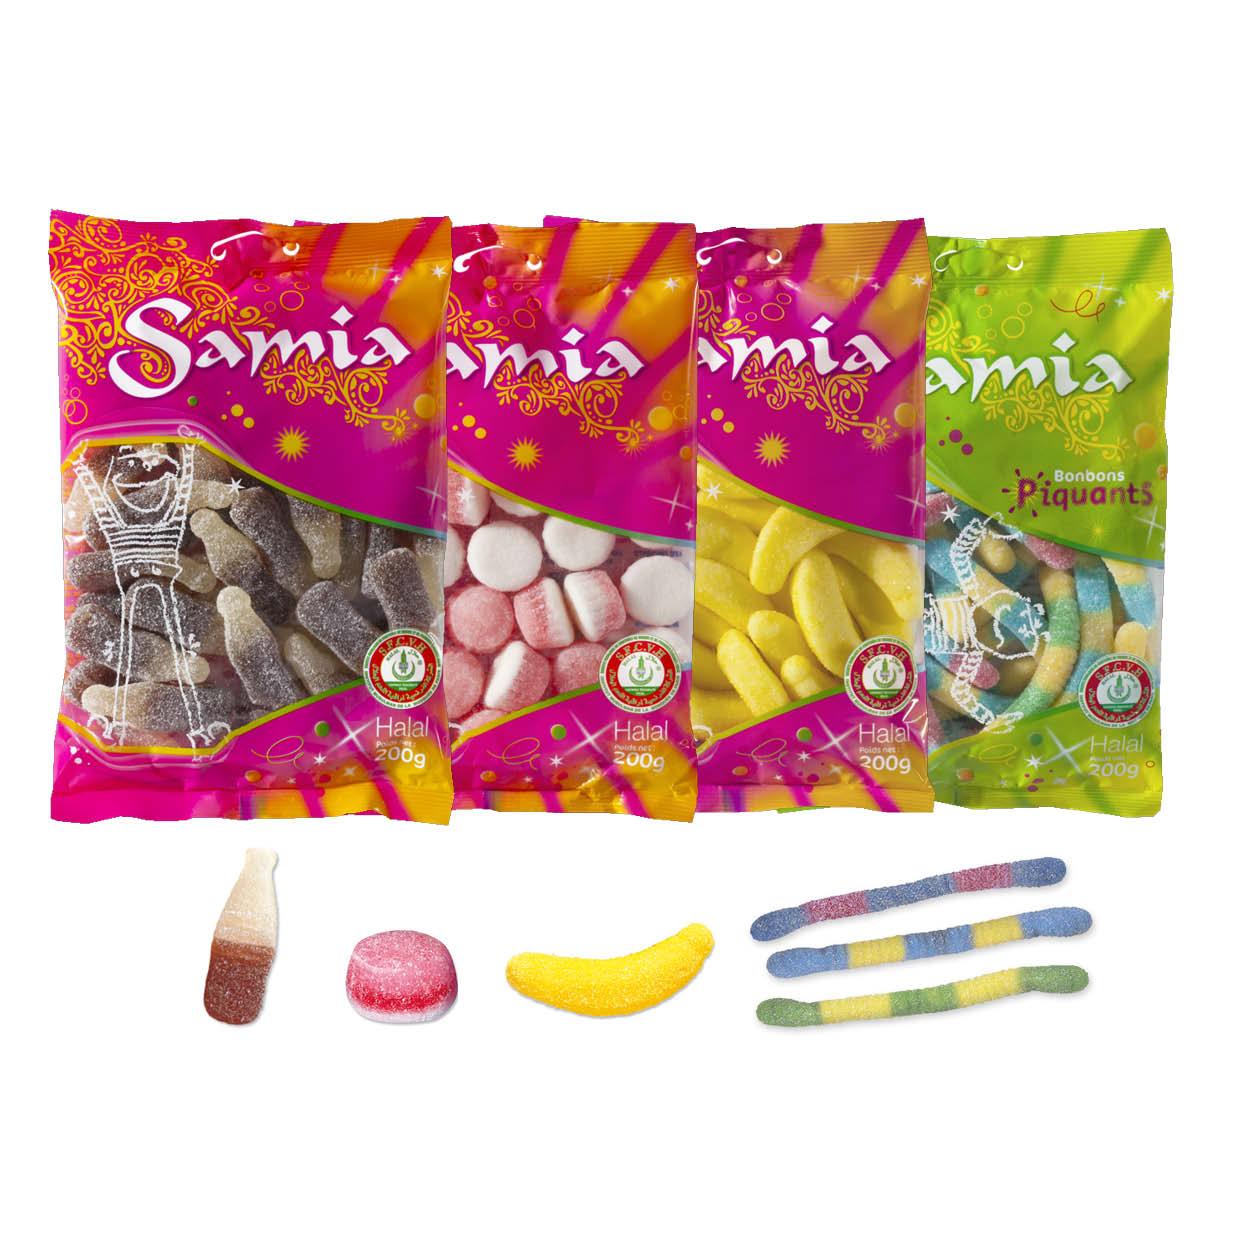 Bonbons Halal Sachets 200 G Samia Haudecoeur